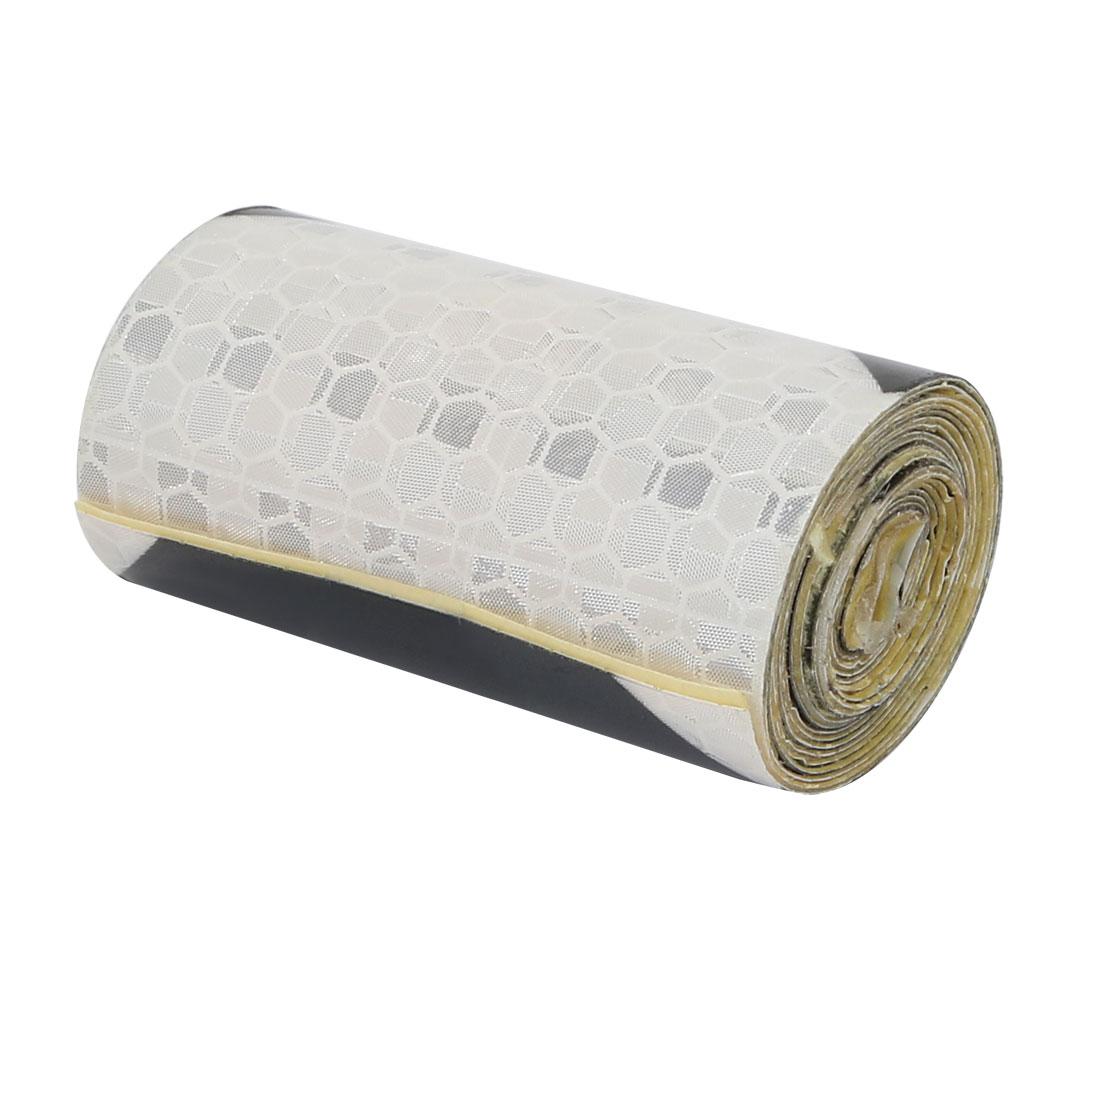 5cm Wide 1 Meter Length Honeycomb Adhesive Reflective Warning Tape Black White